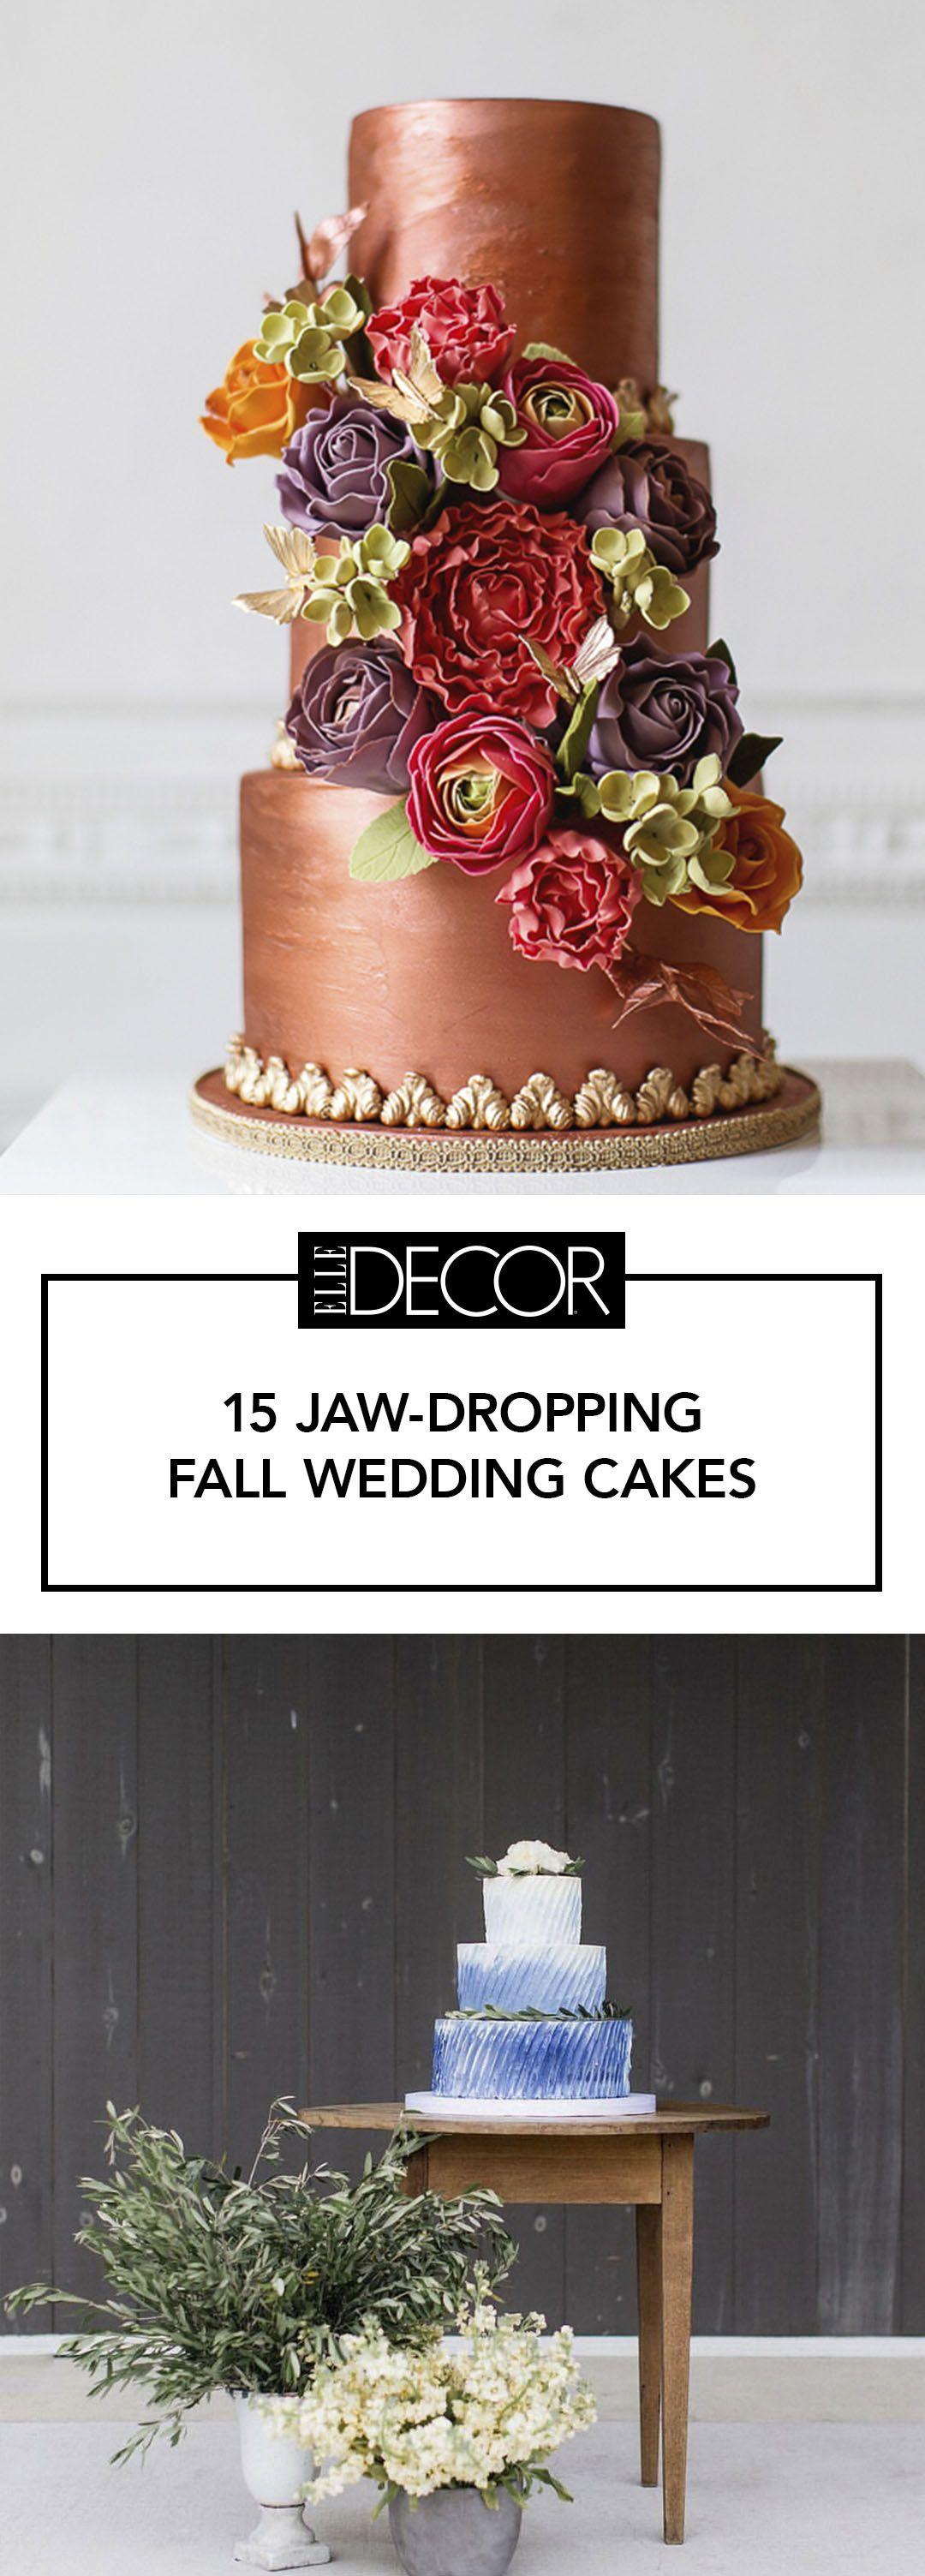 15 elegant fall wedding cakes ideas for fall wedding cake flavors 15 elegant fall wedding cakes ideas for fall wedding cake flavors and design junglespirit Choice Image